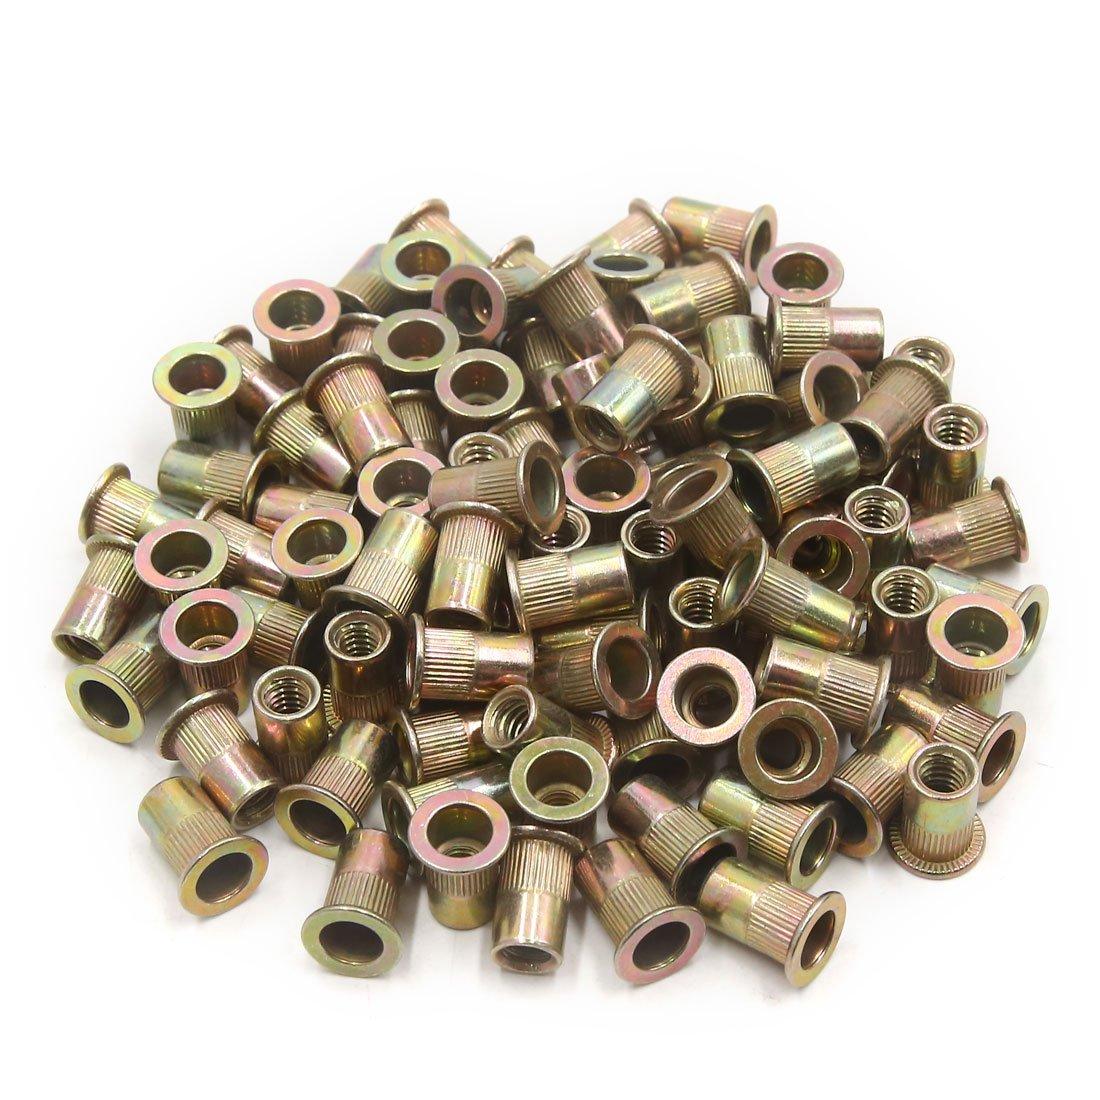 uxcell a17073100ux0532 100Pcs Zinc Plated Carbon Steel Car Rivet Nut Flat Head Threaded Insert Nutsert 1/4-20, 100 Pack